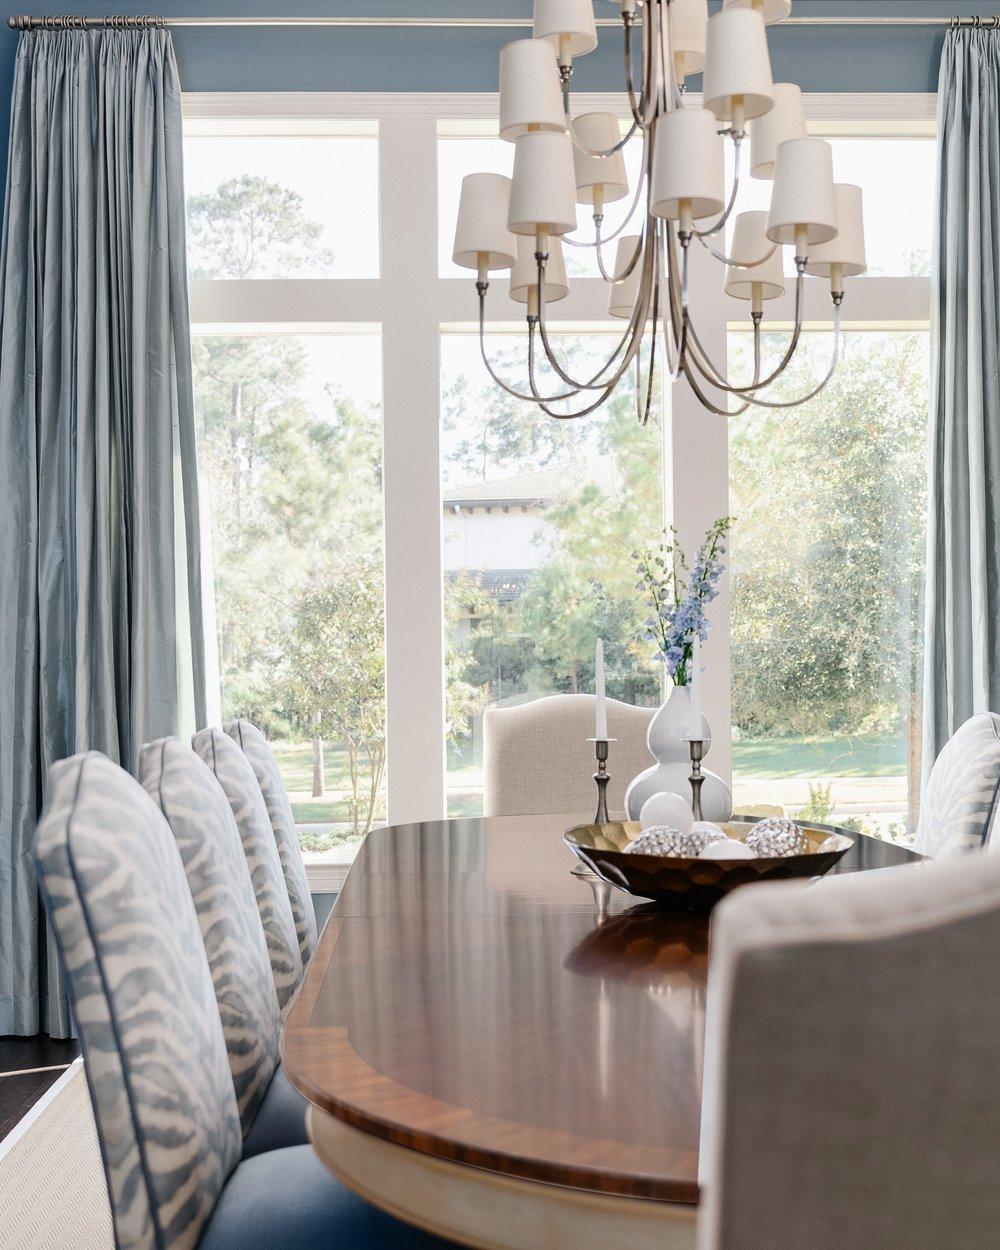 Elegant blue dining room | Carla Aston - Designer,  Colleen Scott - Photographer #diningroomideas #diningroom #bluediningroom #zebrapattern